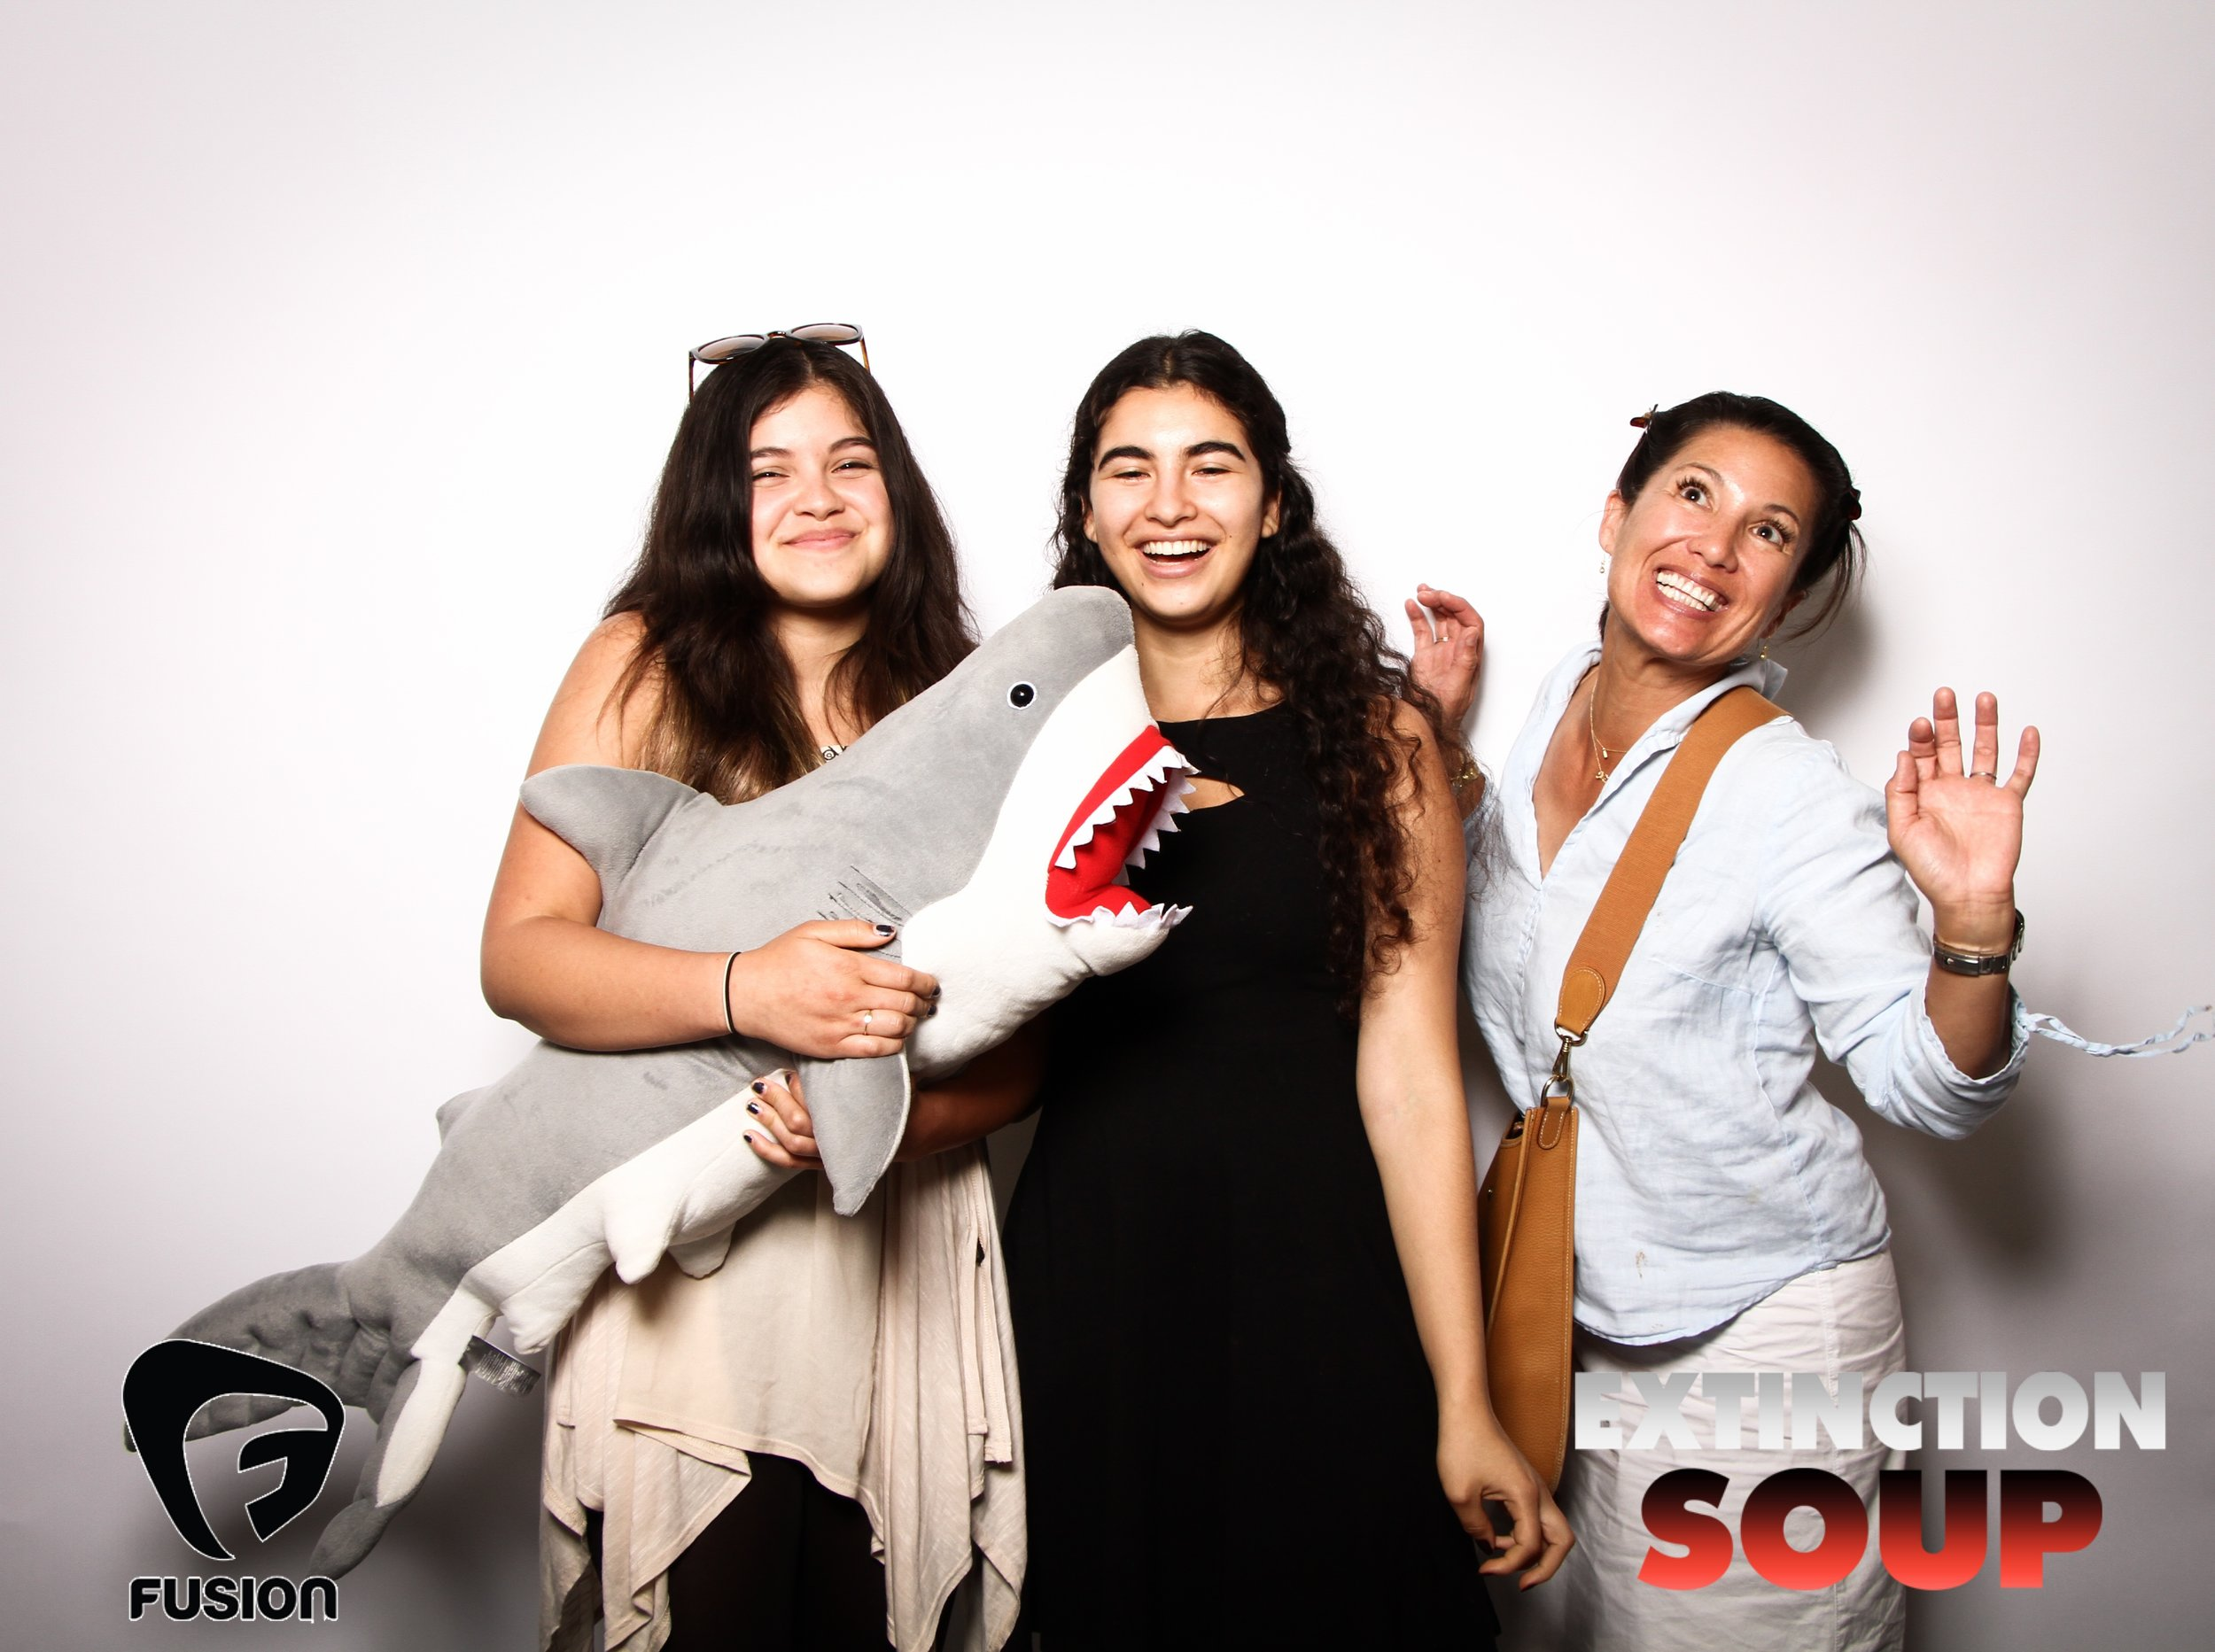 Photo booth fun with shark 4